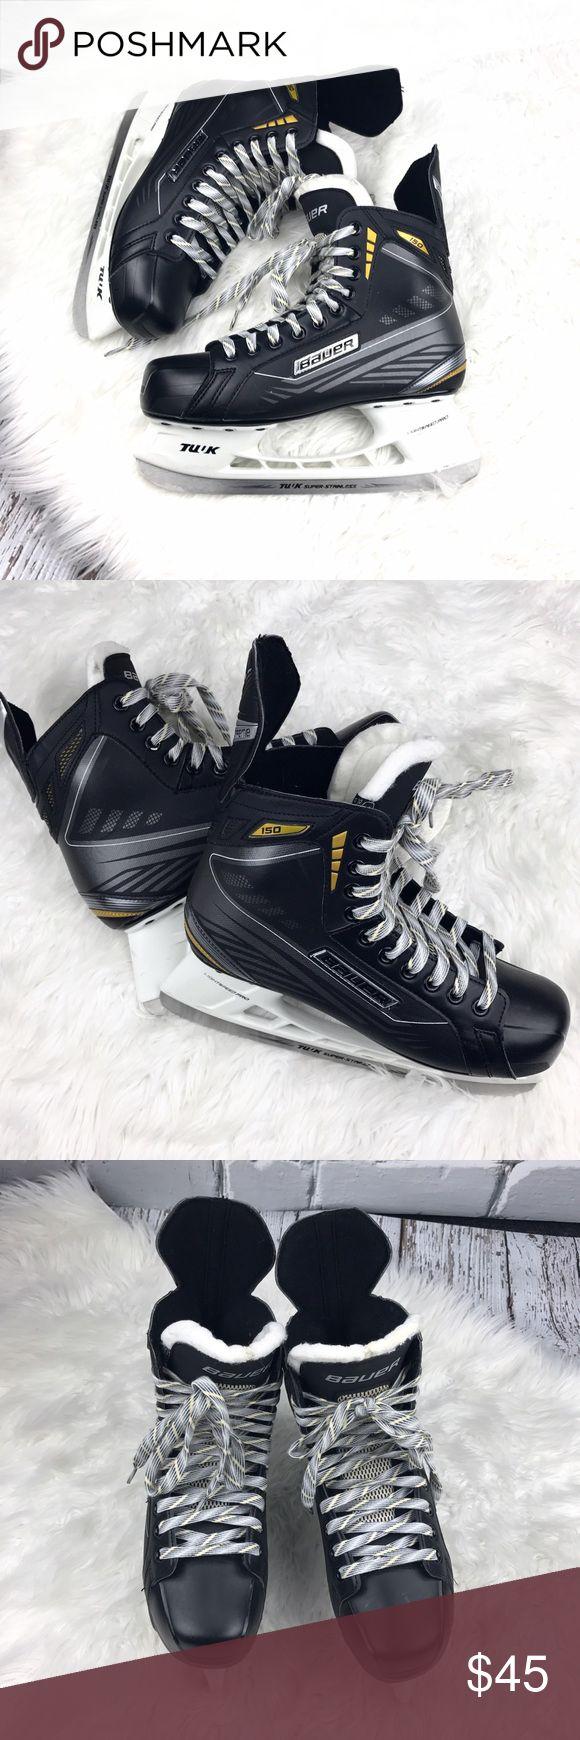 💕SALE💕Bauer Tuik Light Speed Pro Mens Ice Skates Awesome Bauer Tuik Light Speed Pro Mens Ice Skates Bauer Shoes